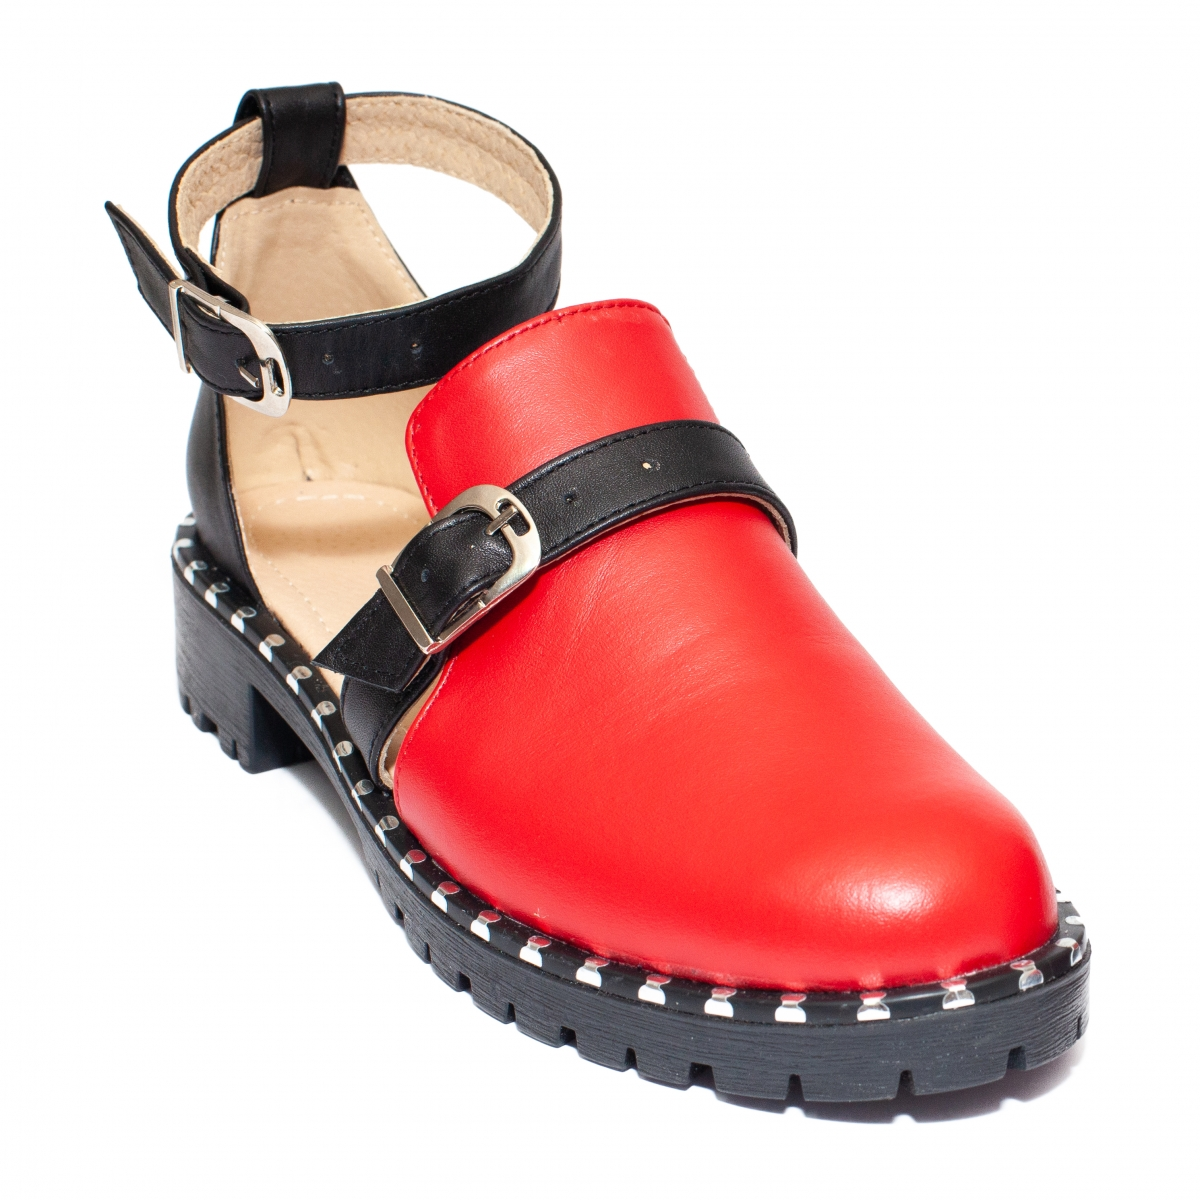 Sandale dama piele 1803 Cika galben negru 35-40